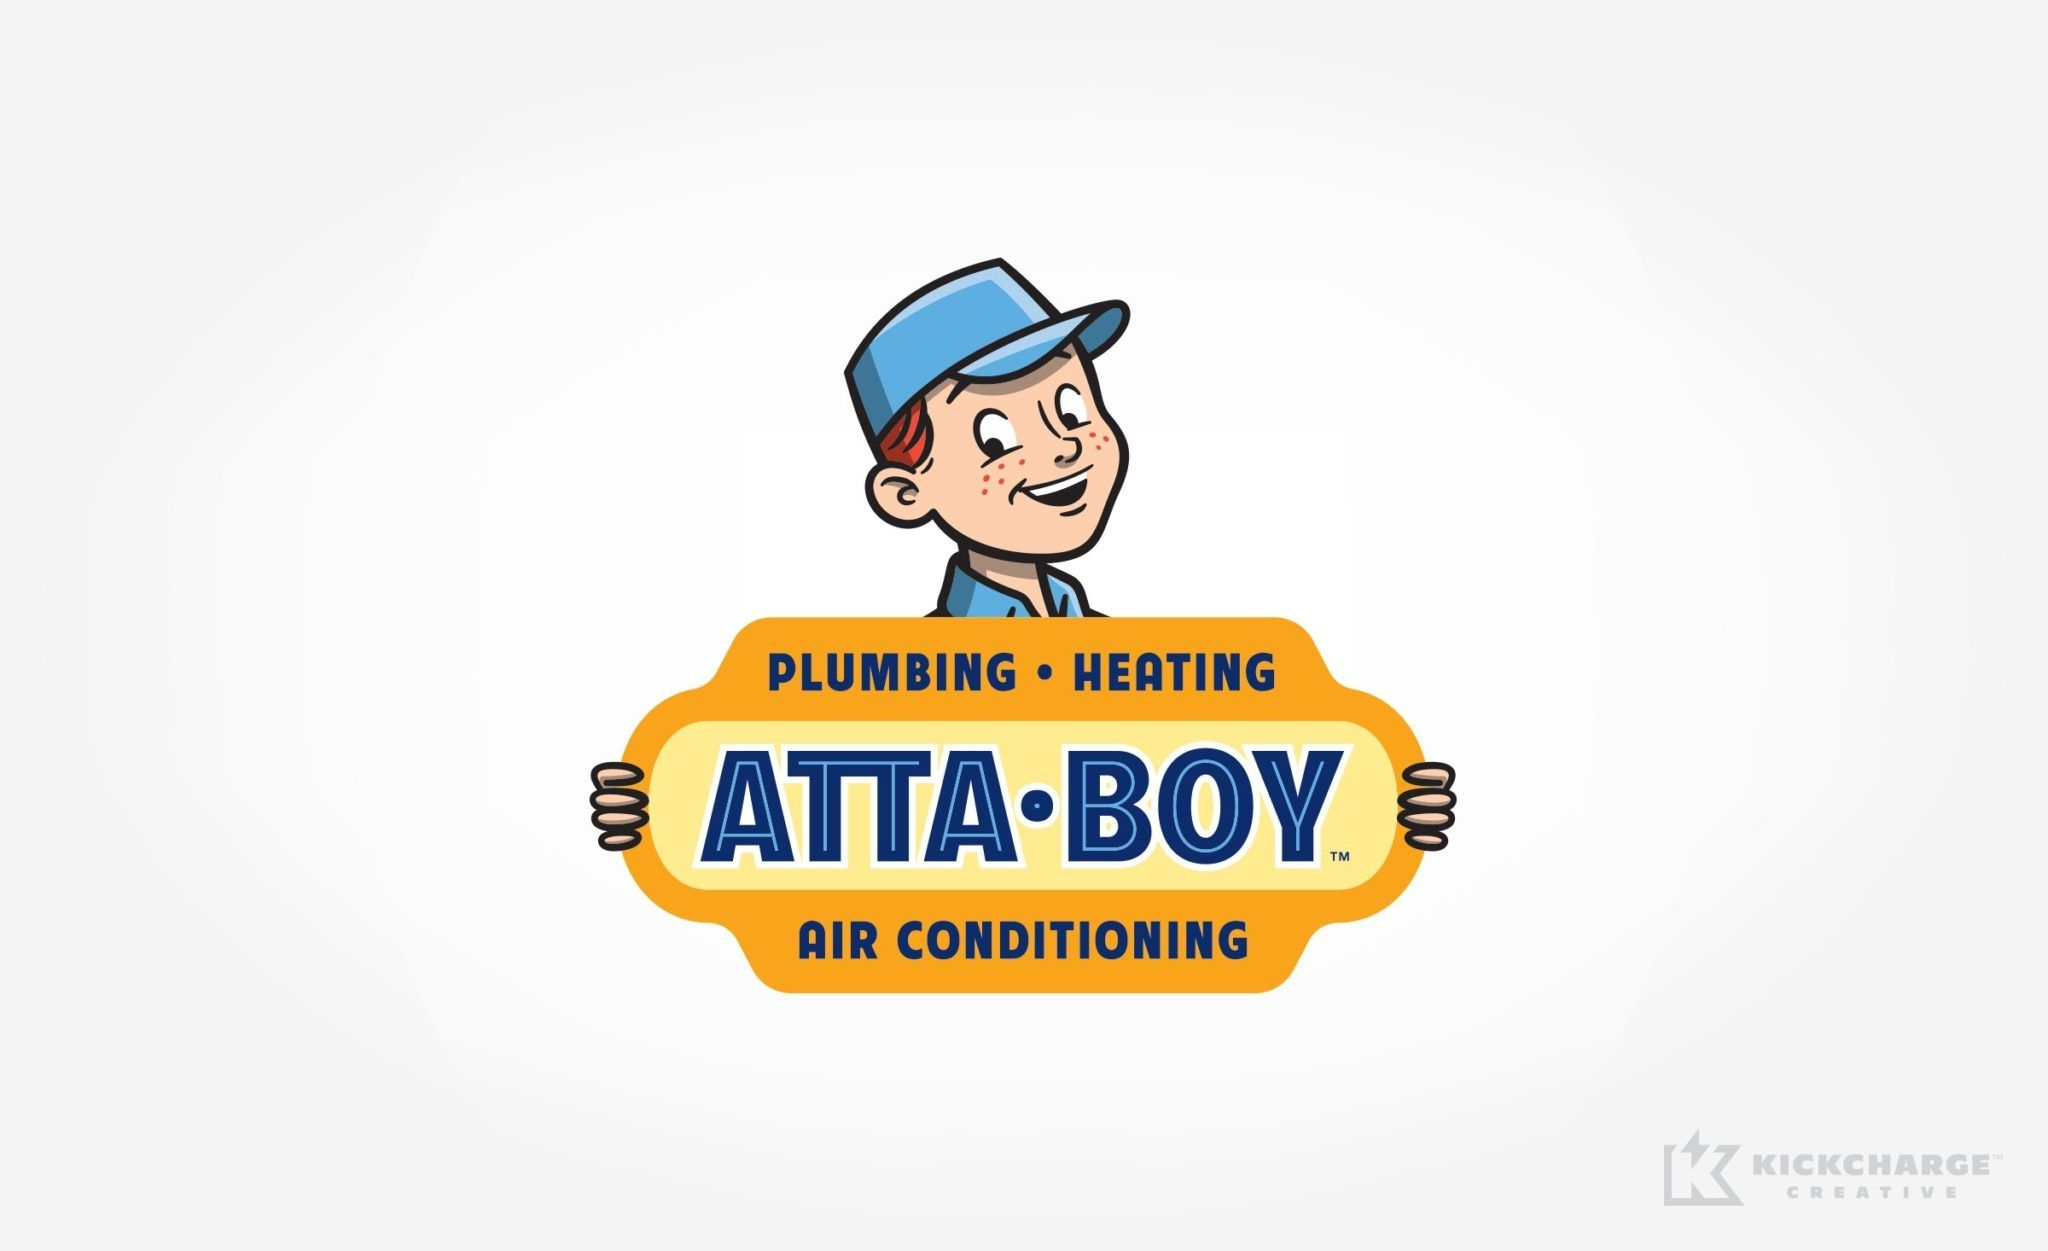 Attaboy Plumbing Kickcharge Creative Plumbing Logo Design